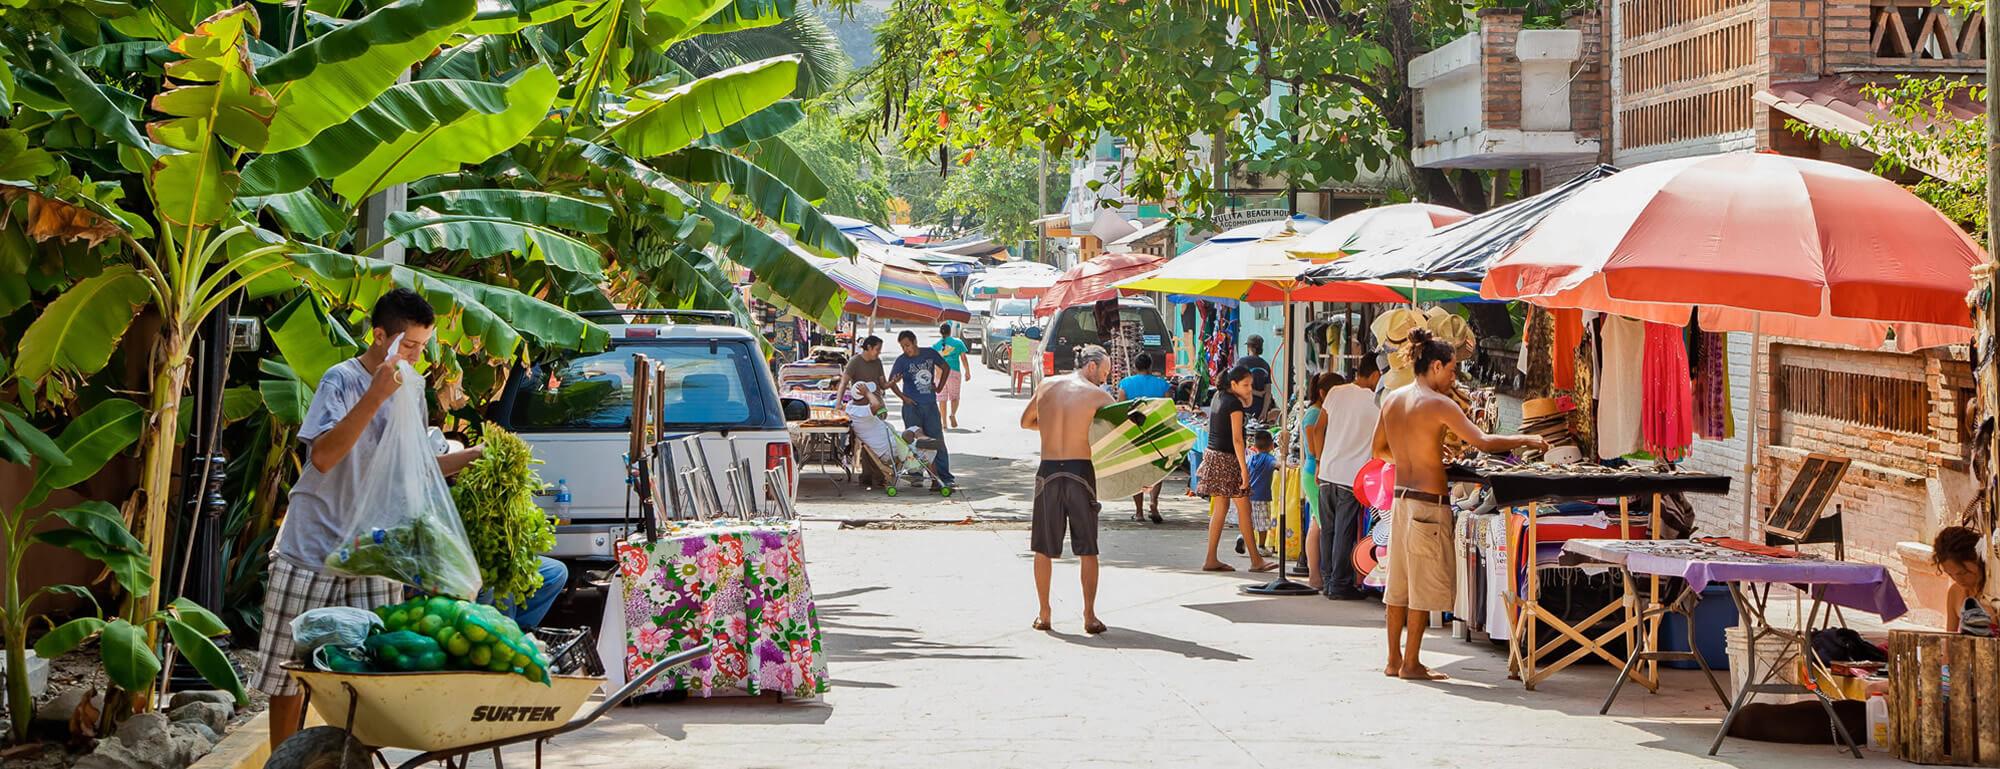 sayulita, nayarit, vacances, mexique